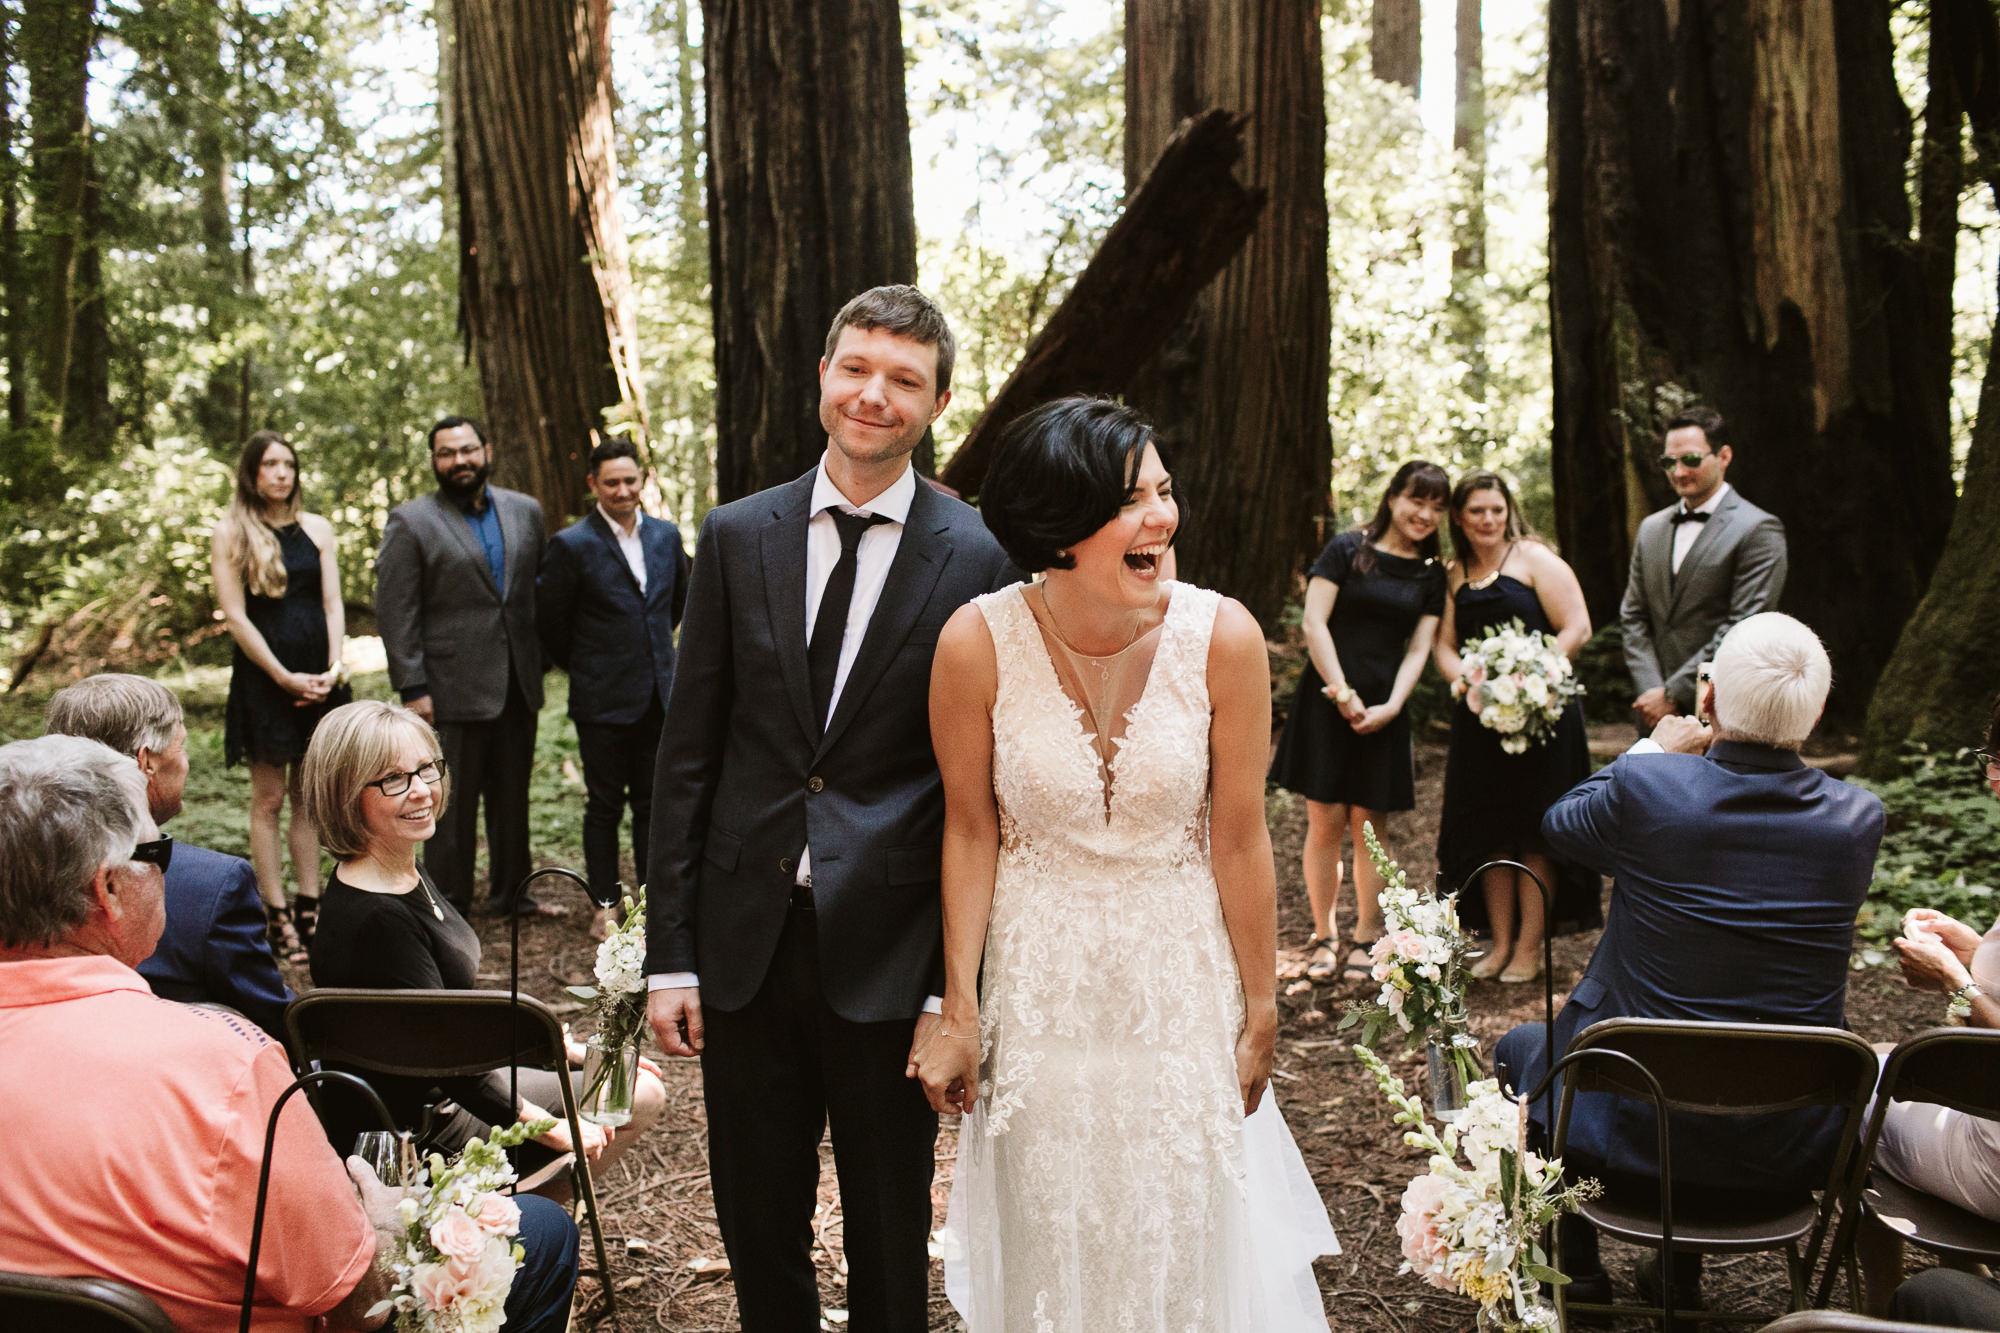 California-wedding-photographer-alfonso-flores-pamplin-groove-213.jpg